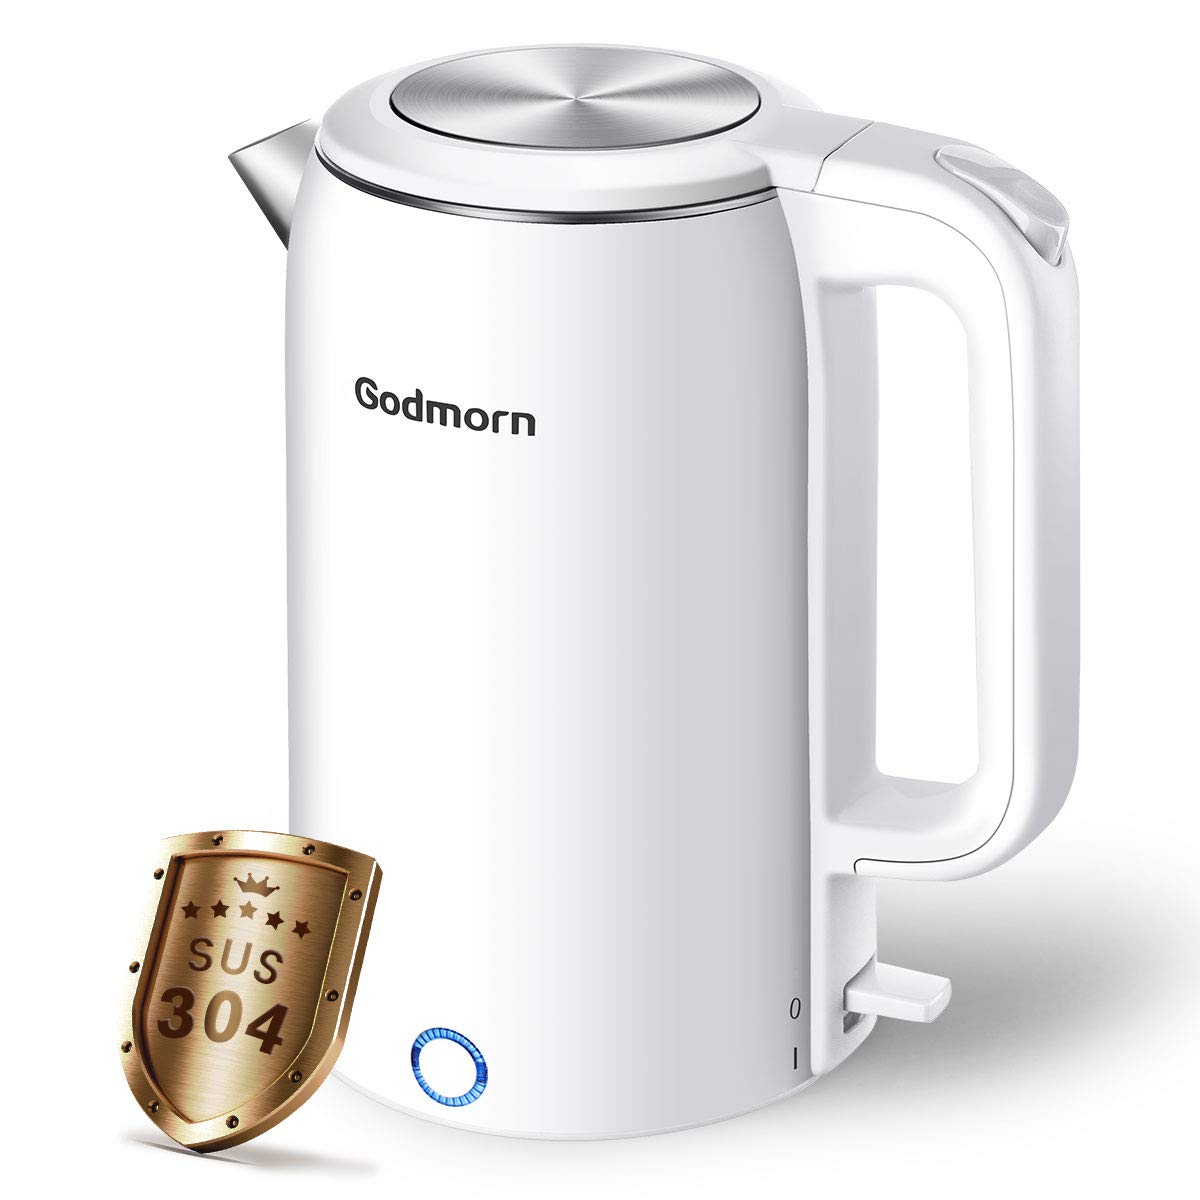 Wasserkocher-Godmorn-Elektrischer-Doppelwandiger-Wasserkessel-18L-Edelstahl-Teekocher-Abschaltautomatik-Trockengehschutz-Kabellos-Kalkfilter-1500-Watt-BPA-Free-Wei